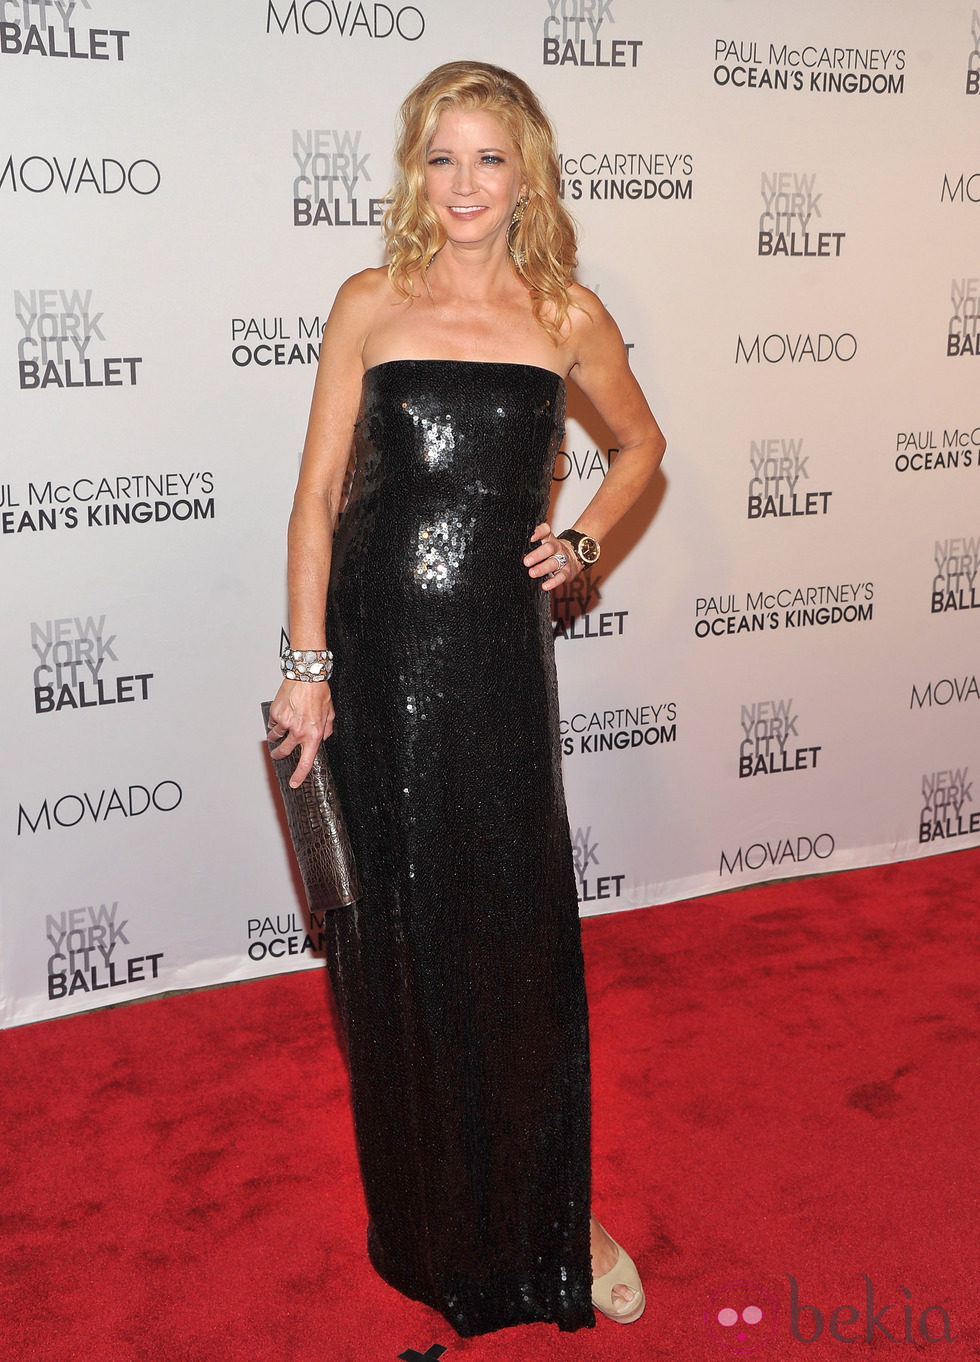 Candace Bushnell en la New York City Ballet Fall Gala 2011